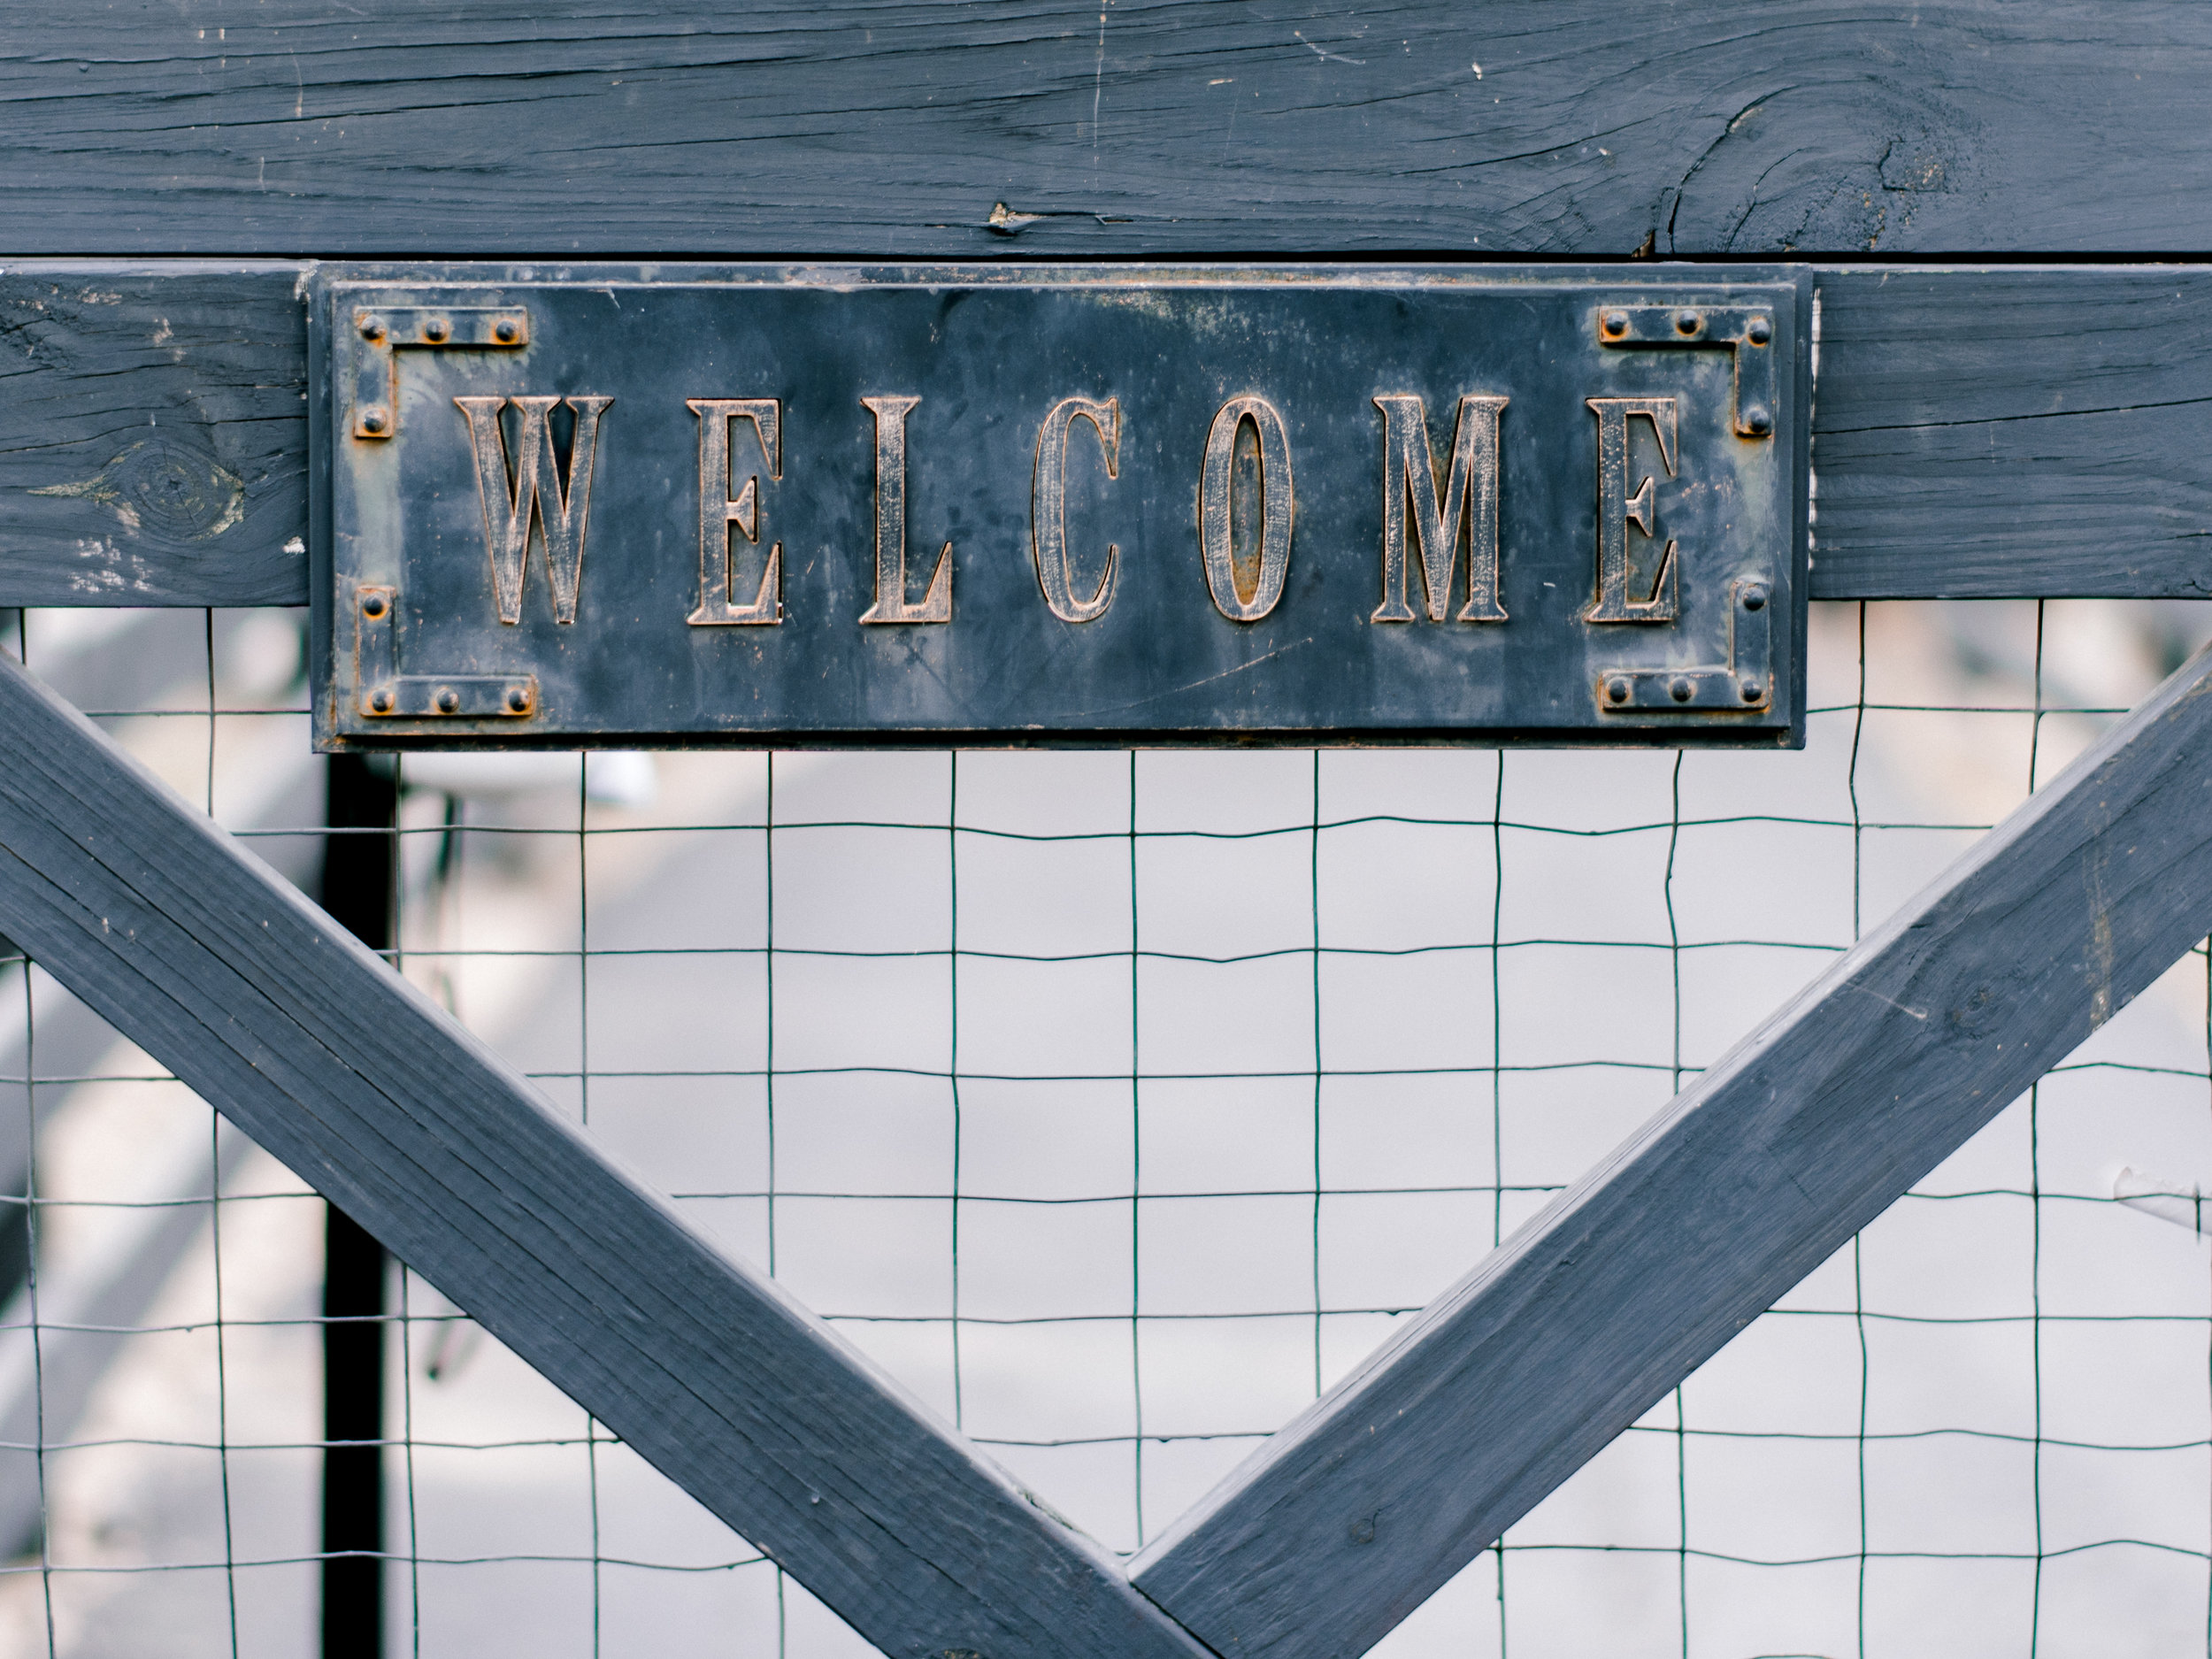 welcome (1 of 1).JPG